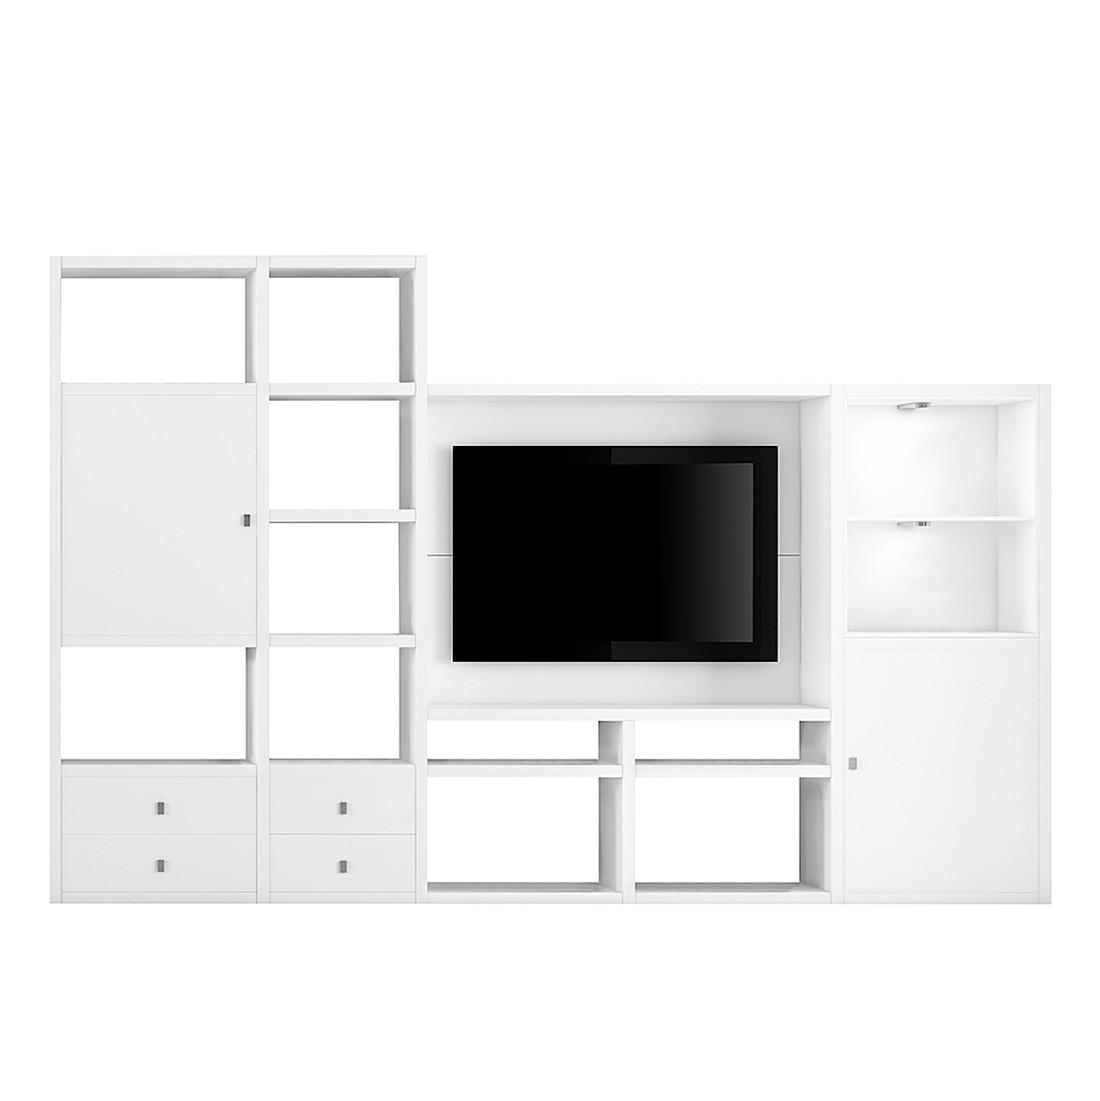 Home 24 - Eek a+, meuble tv emporior ii - avec éclairage - blanc, loftscape